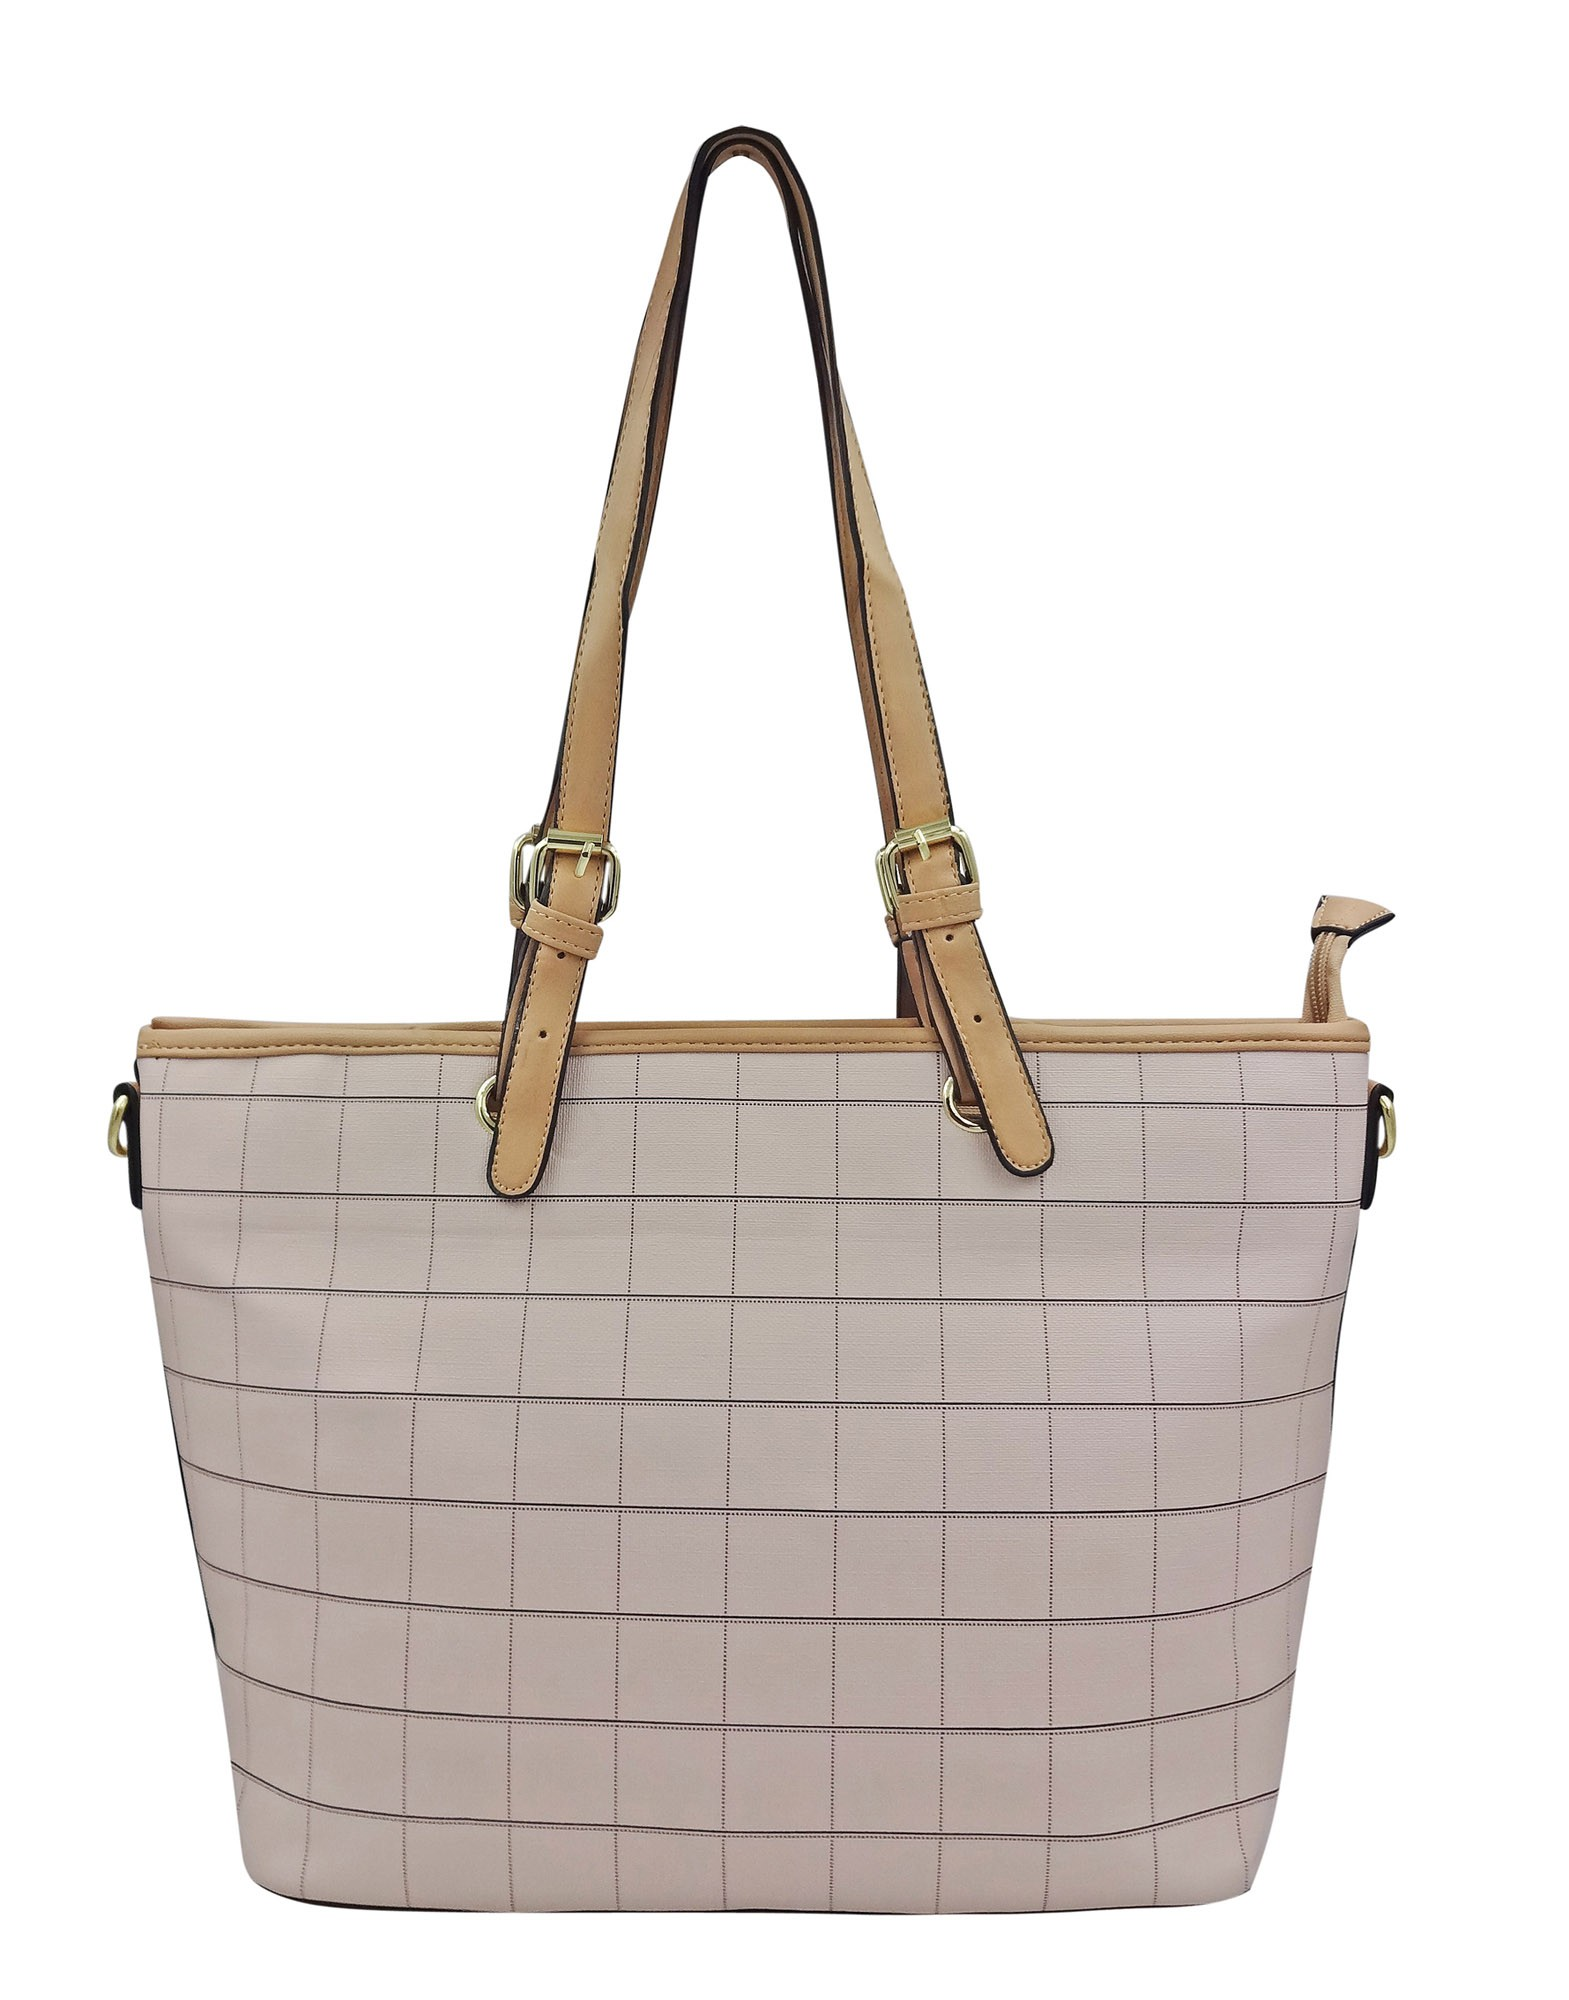 Bolsa Feminina Shopper Estampa Quadriculada